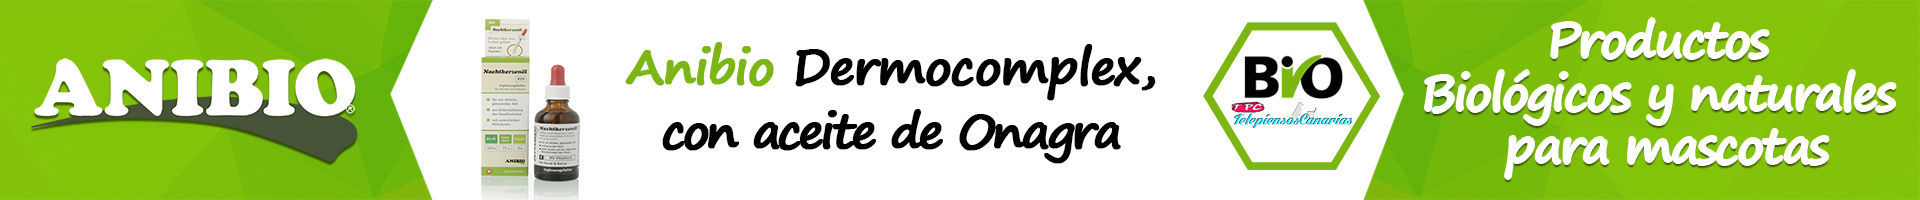 Anibio dermocomplex akut